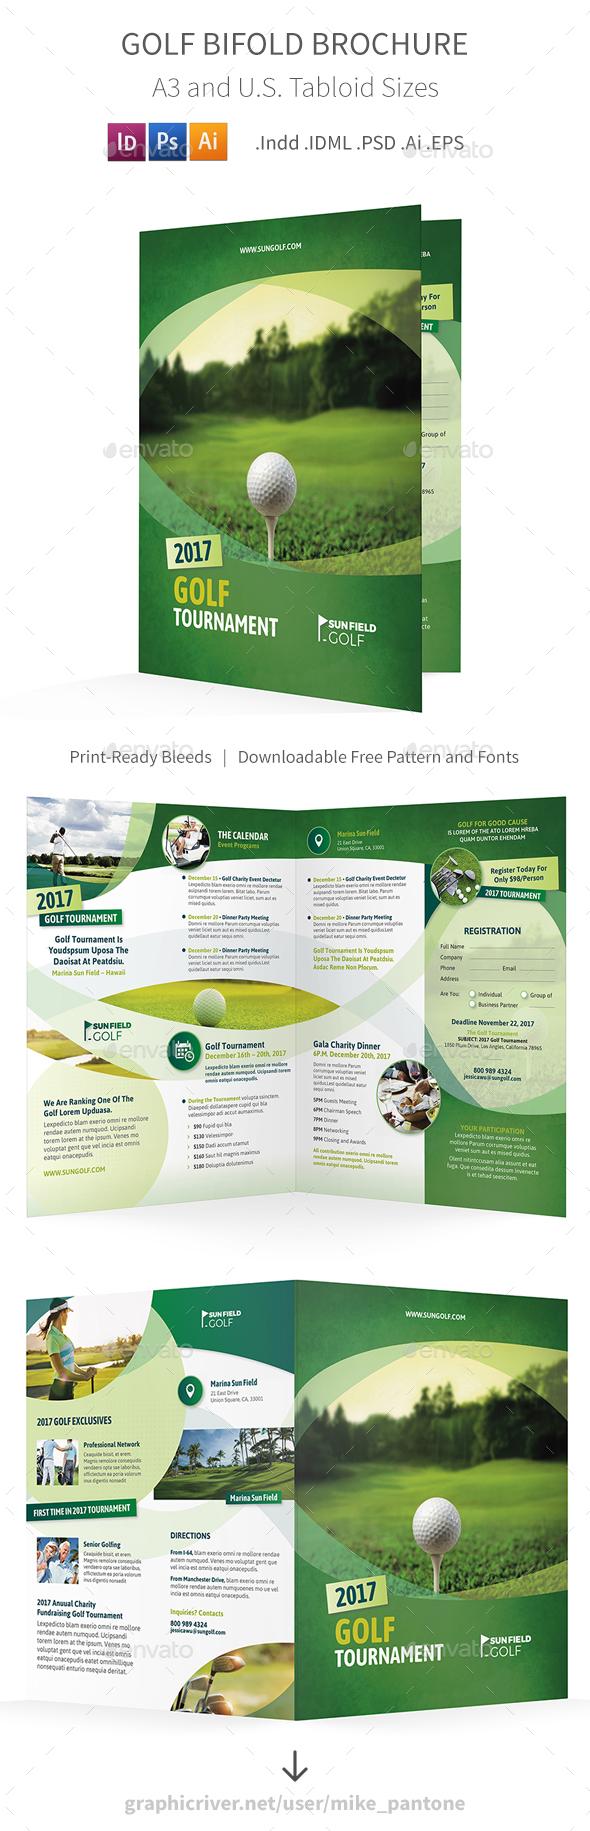 GraphicRiver Golf Bifold Halffold Brochure 7 20844948